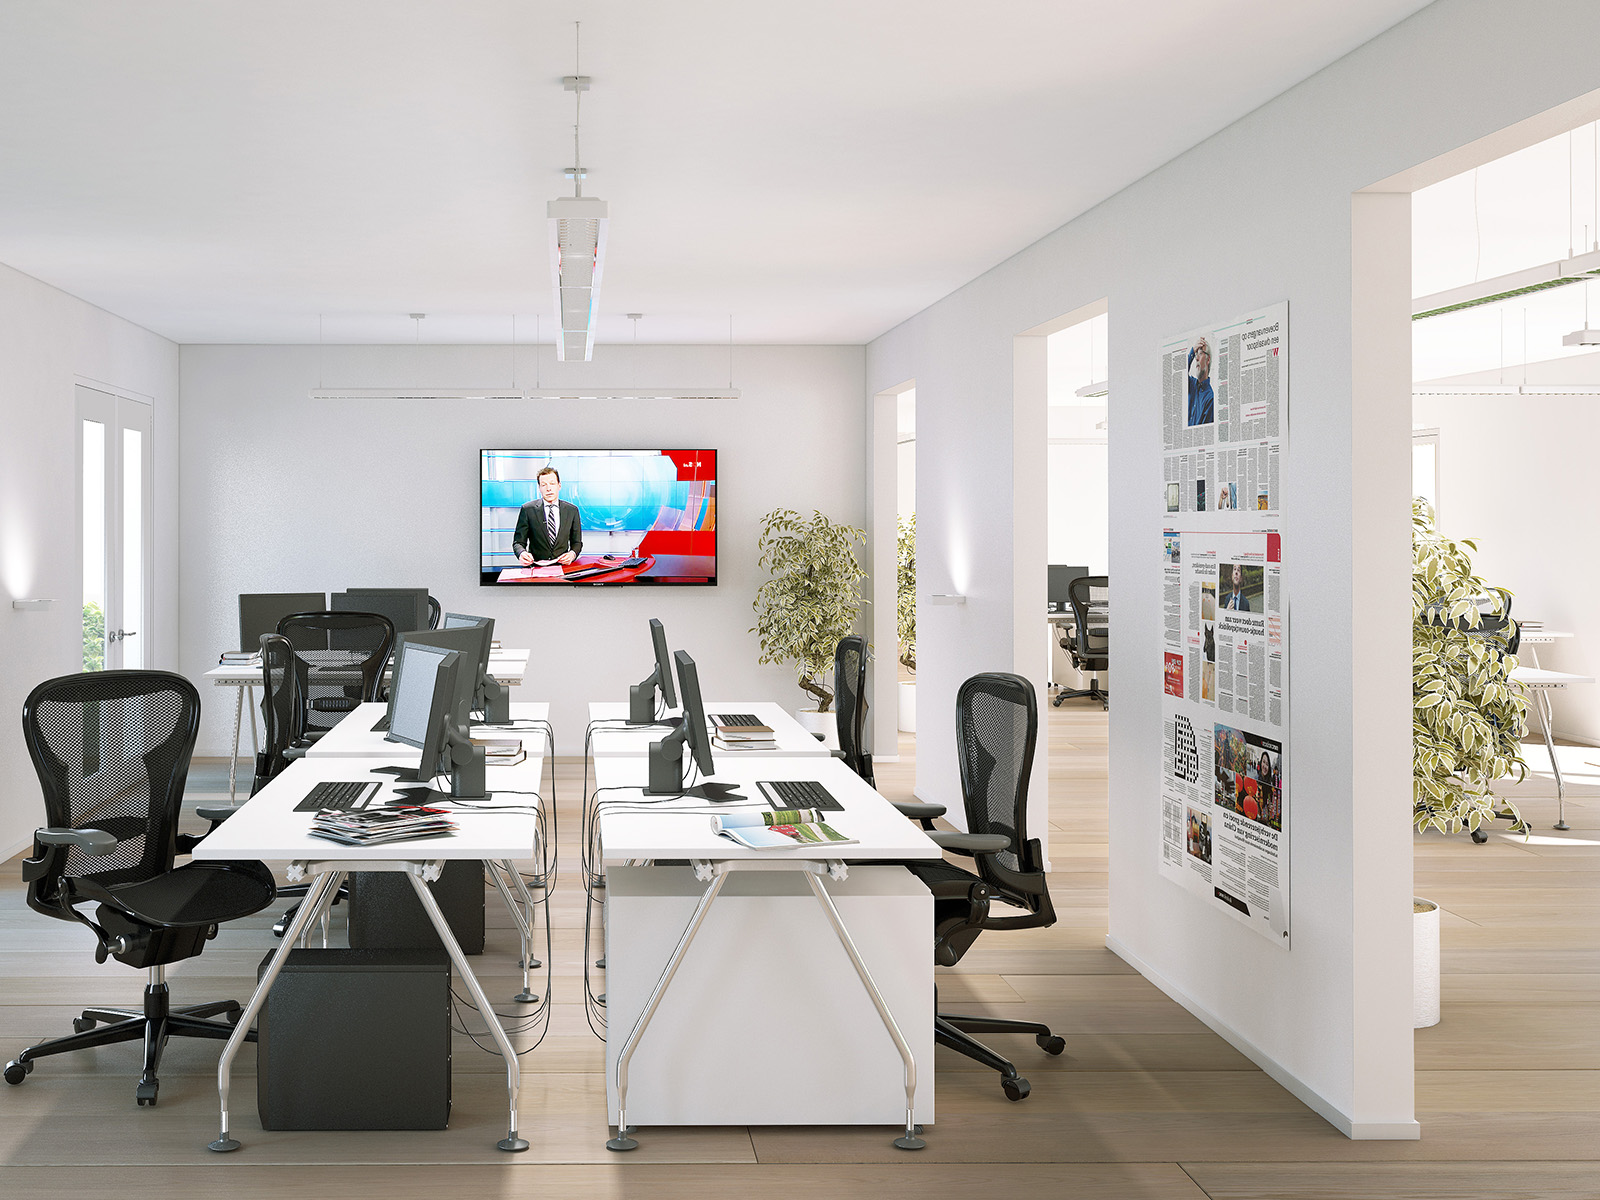 interieurvisualisatie modern kantoor DWanimation